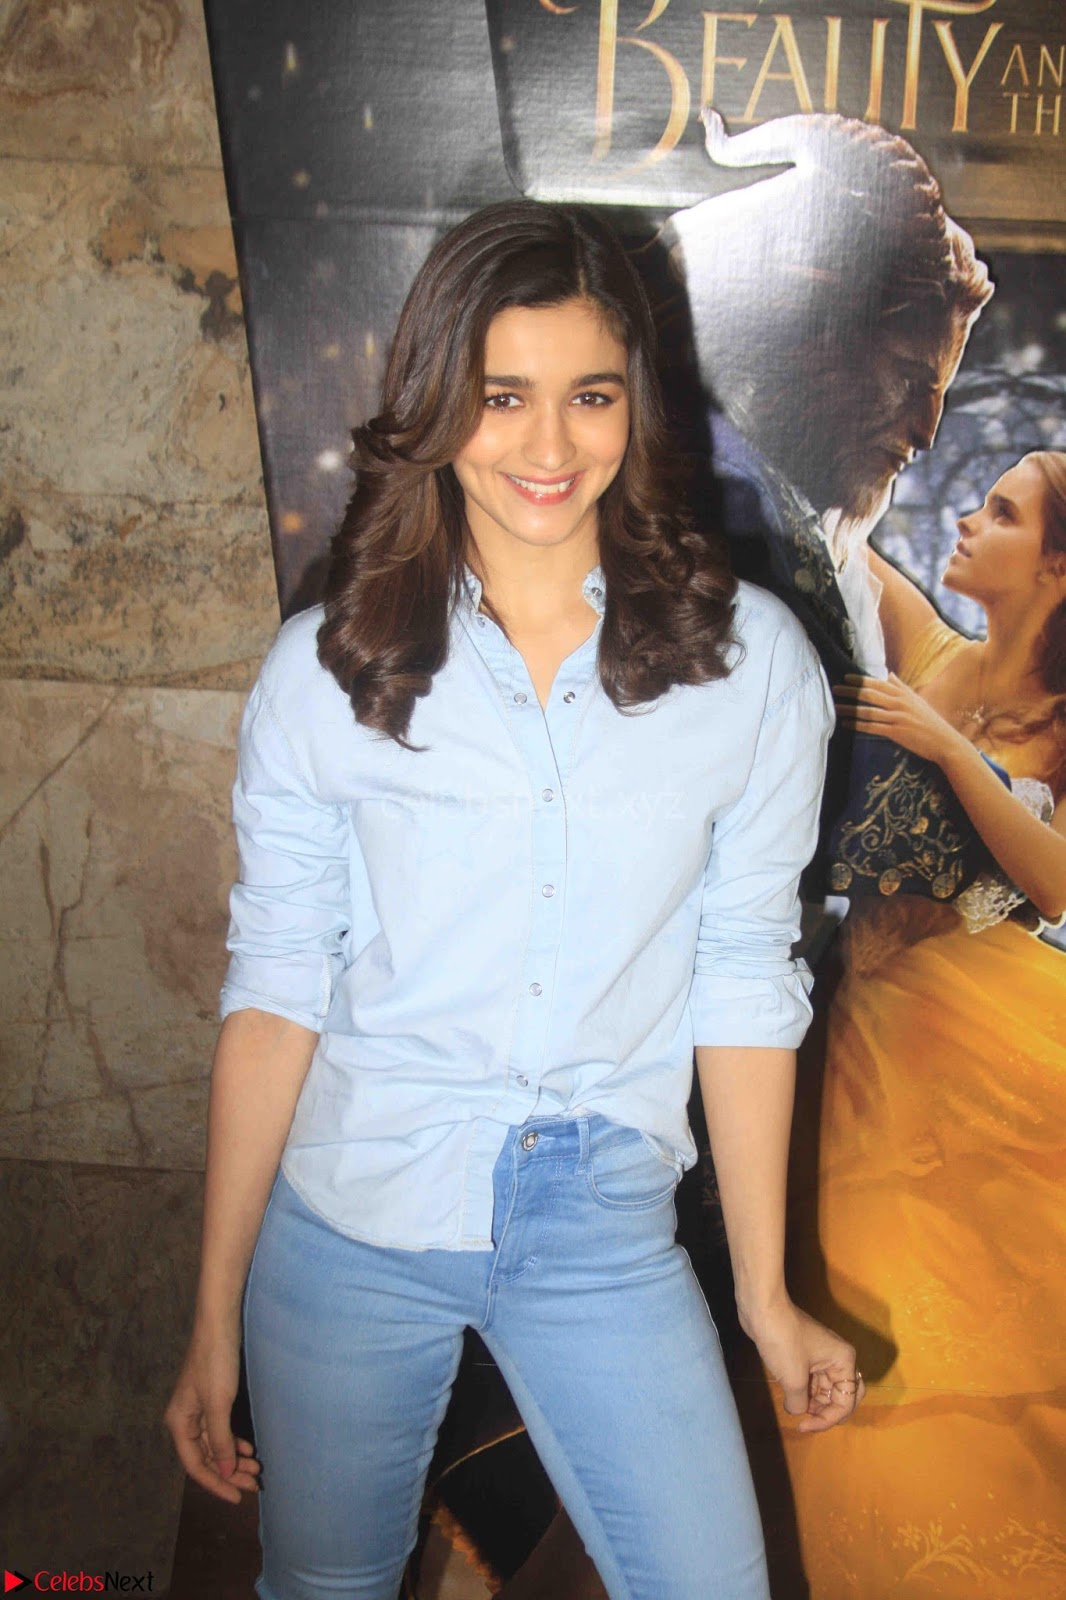 Alia Bhatt in Denim and jeans with NGO Kids 14 - Alia Bhatt looks super cute in Denim jeans and ...